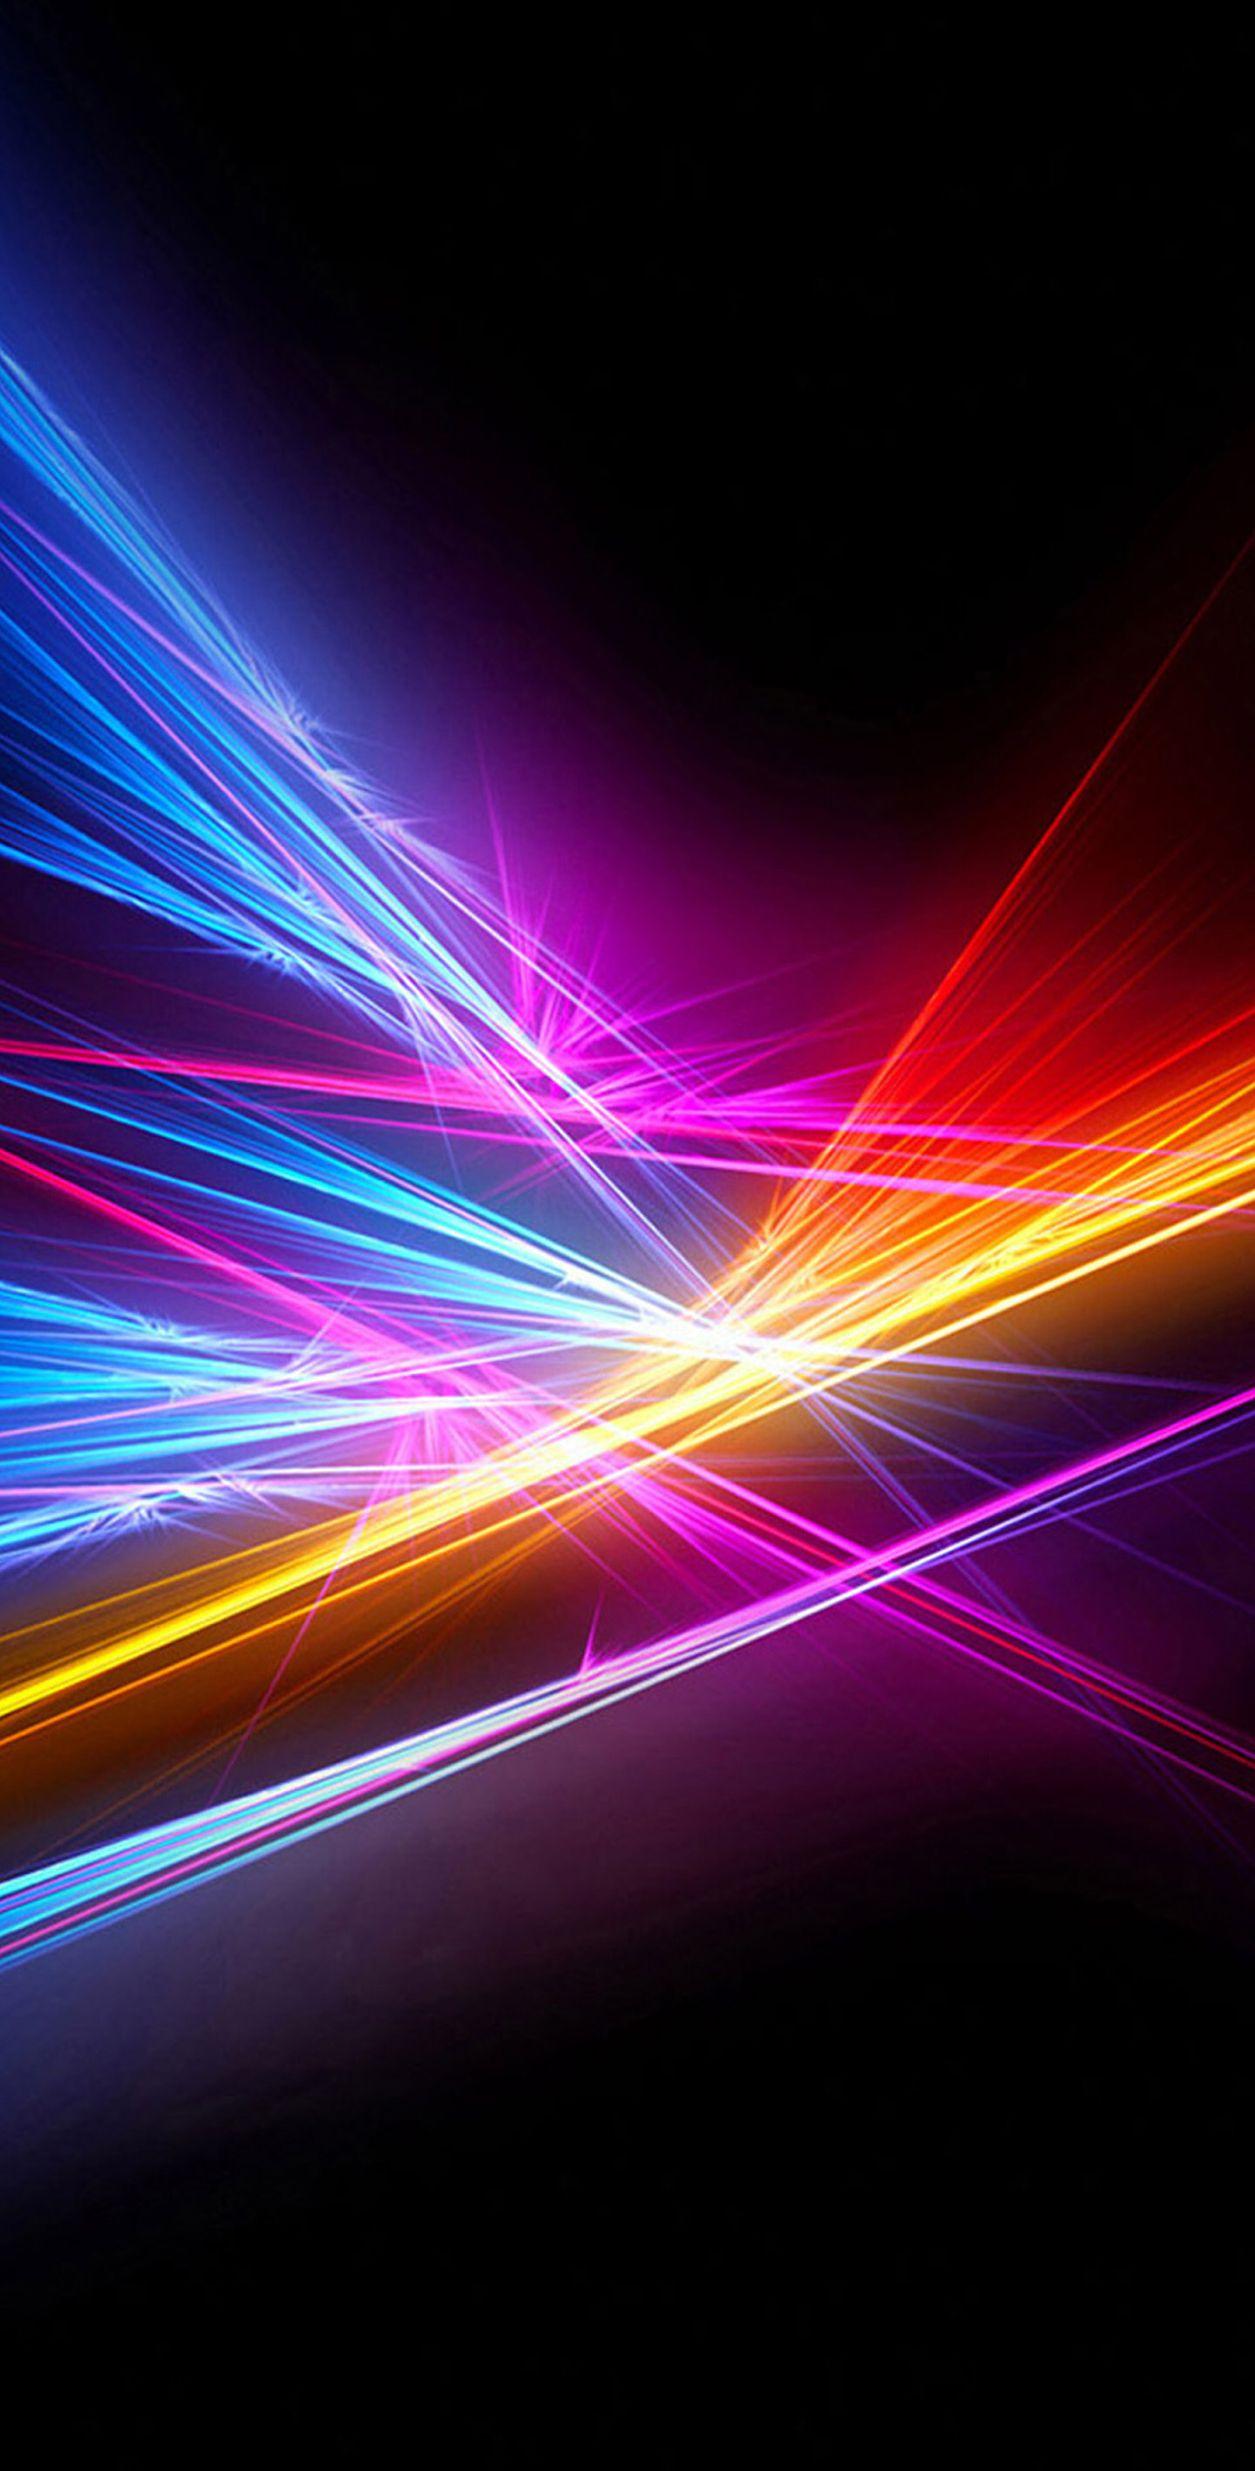 Blue, red, purple, lights, neon, minimal, abstract